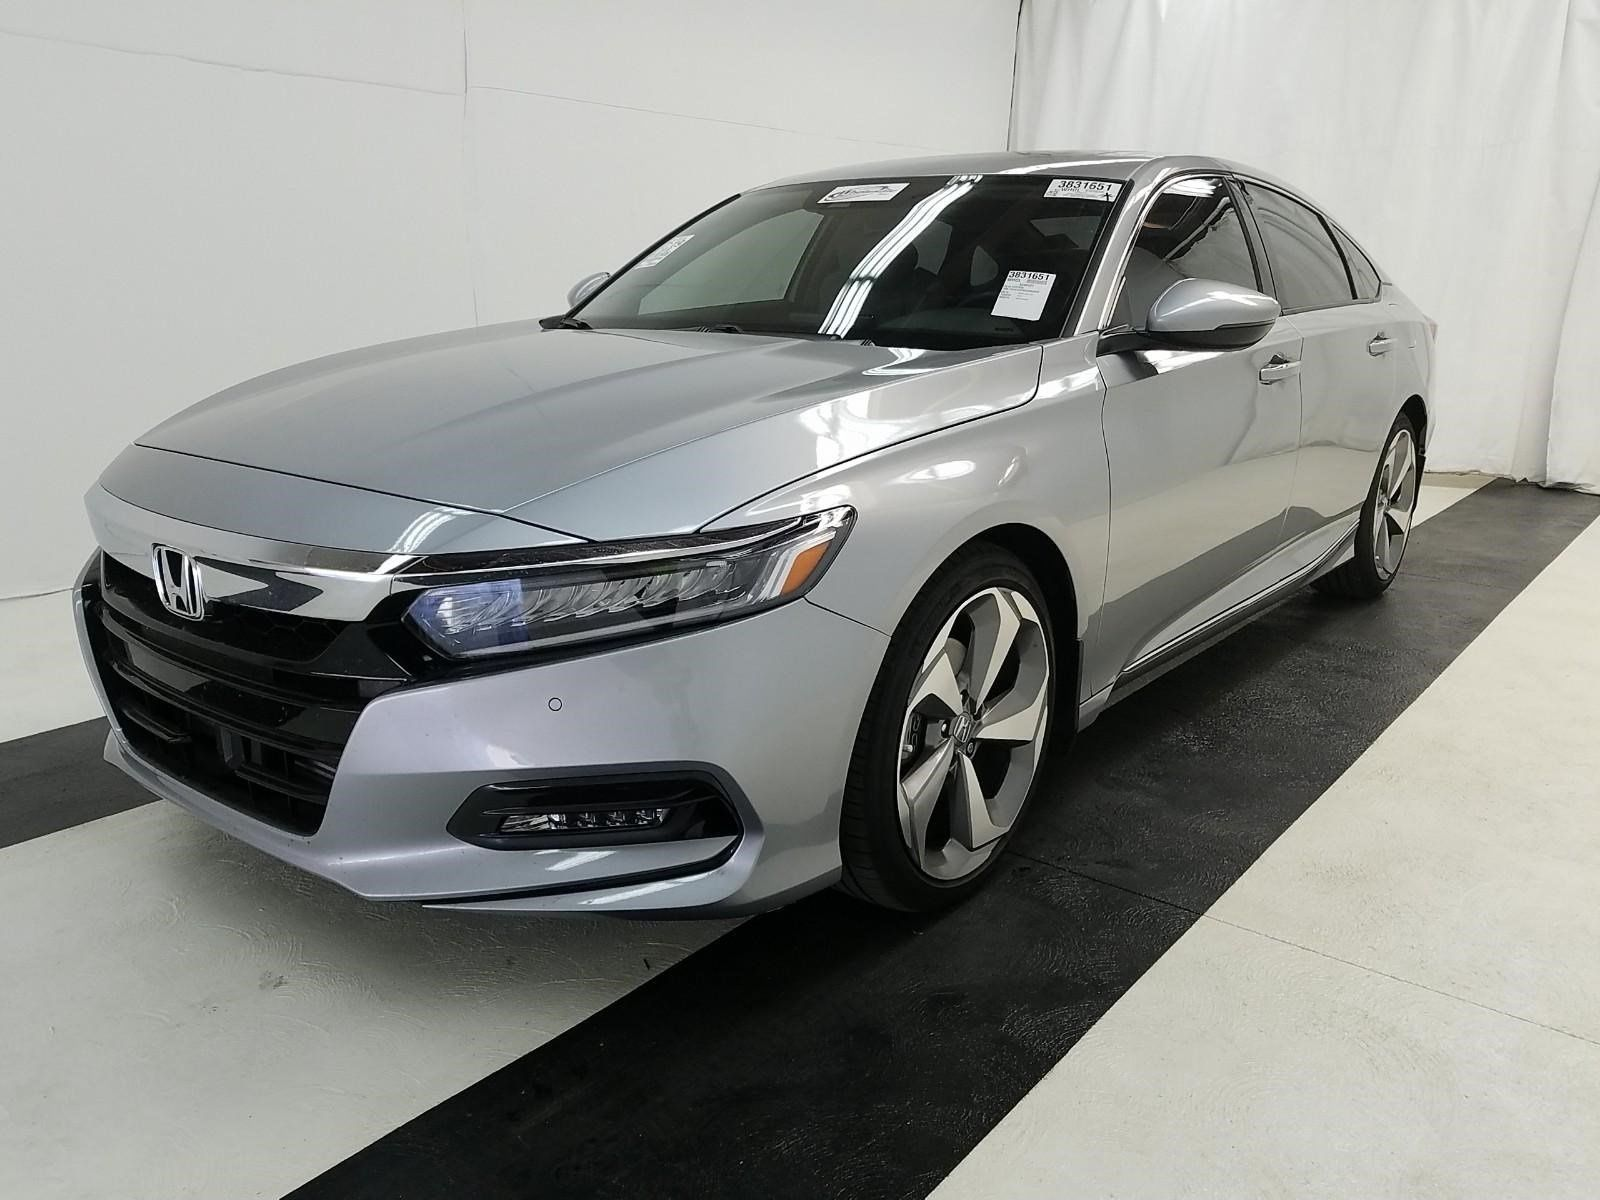 2018 Honda Accord Sedan Touring 2 0T 4dr Car near